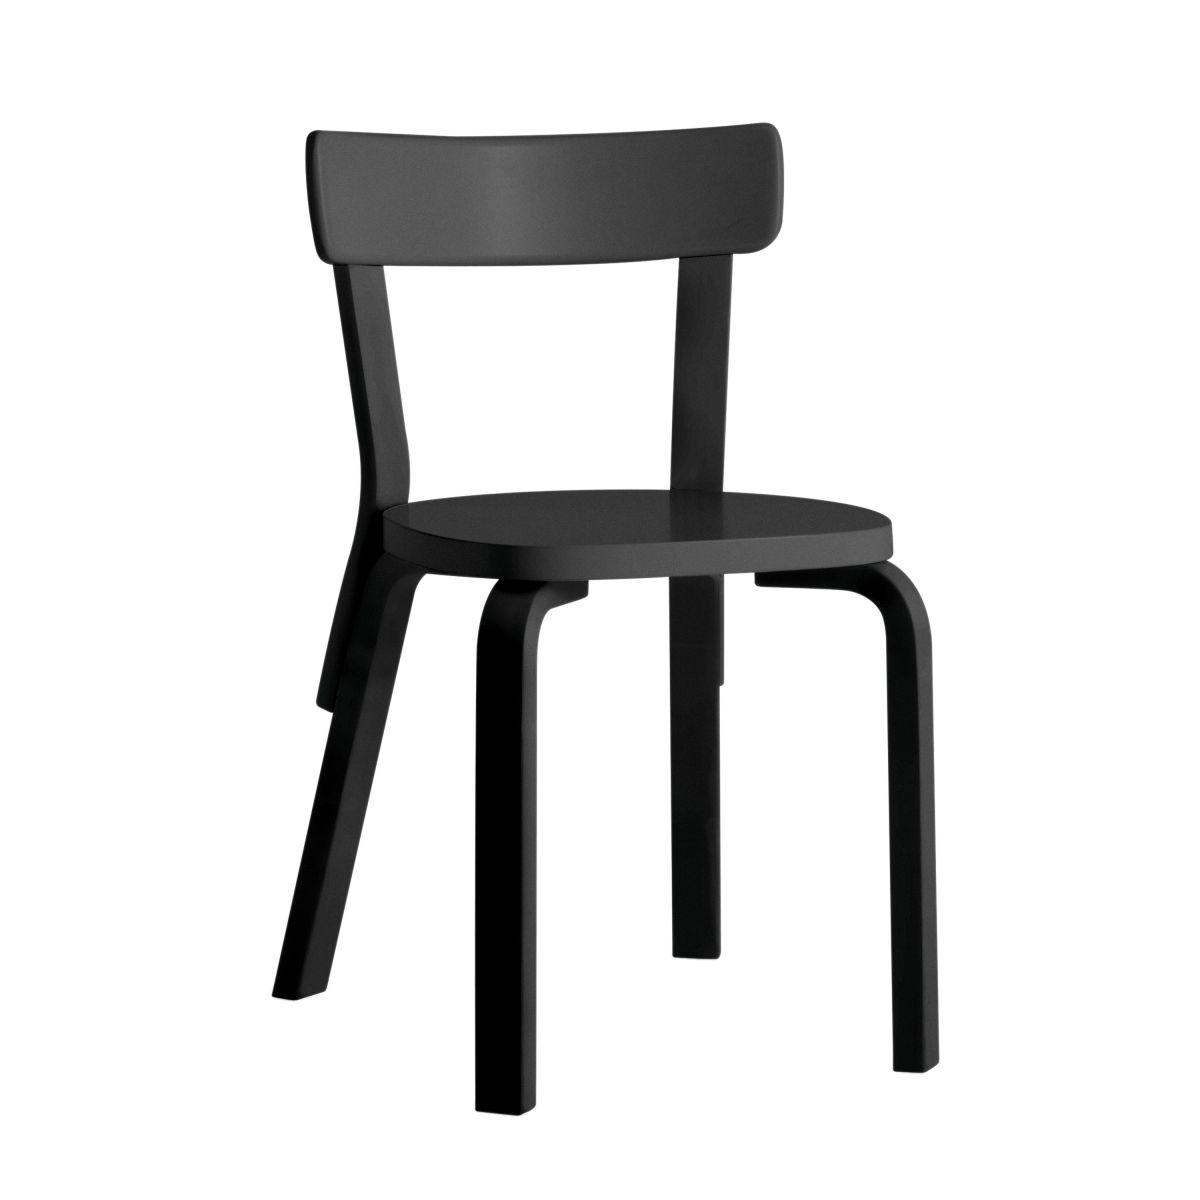 Chair 69 black lacquer_2